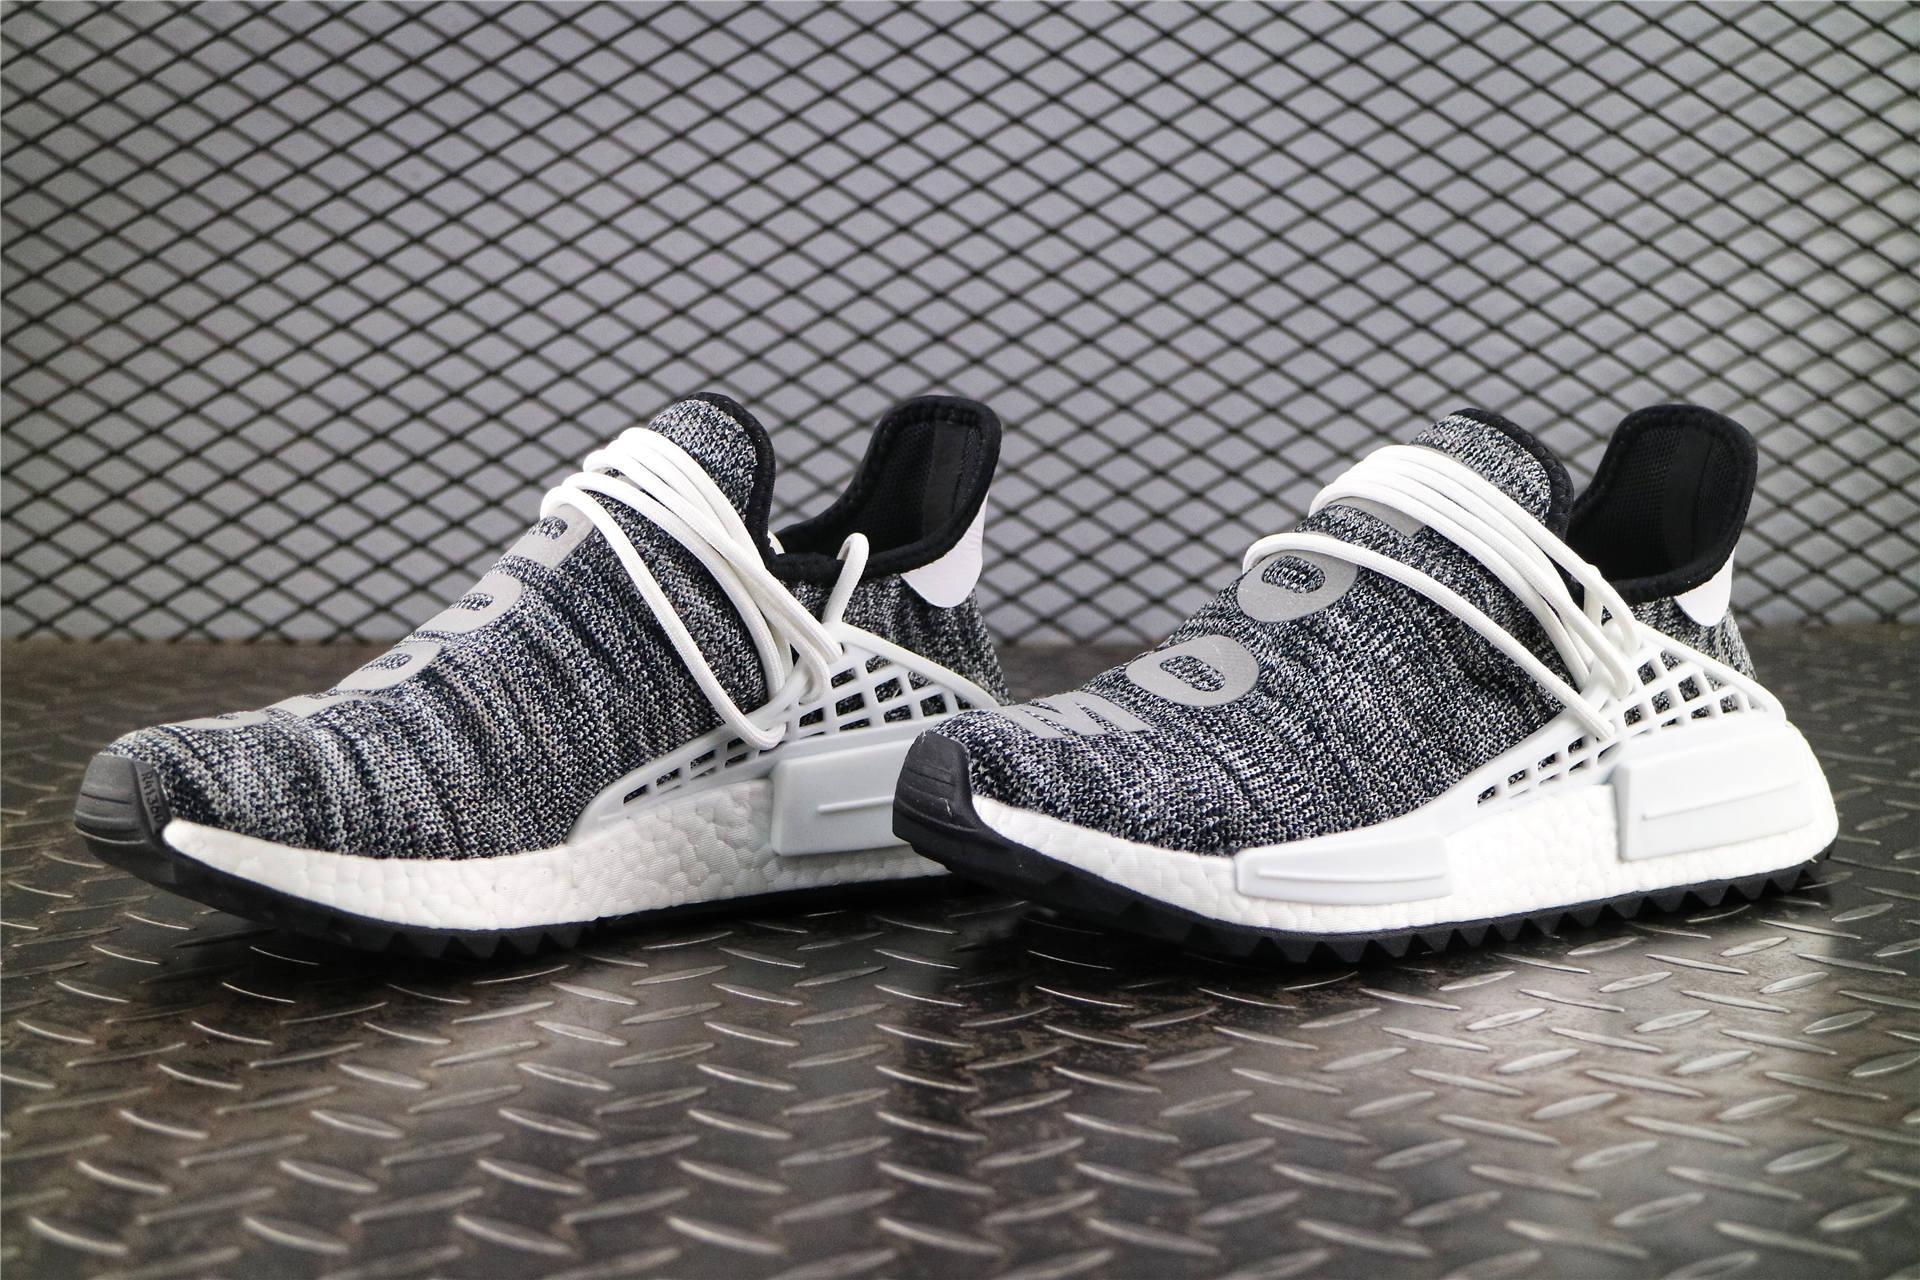 4b6c525f2b003 Кроссовки мужские Adidas Nmd X Pharrell Williams HUMAN RACE TRAIL Core Black    White